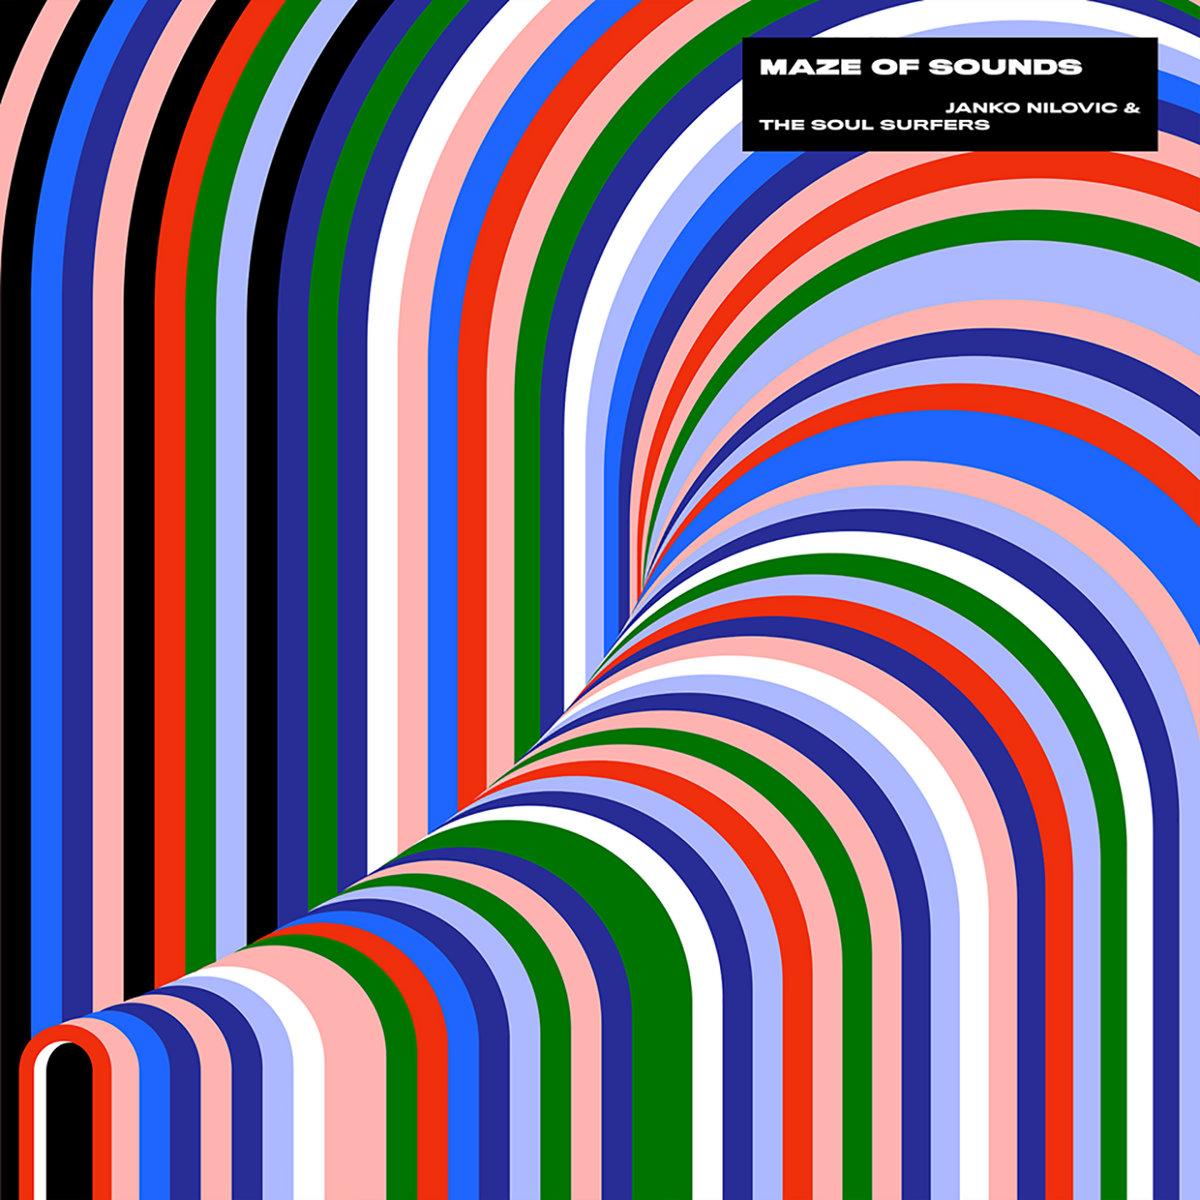 Maze of Sounds de Janko Nilovic